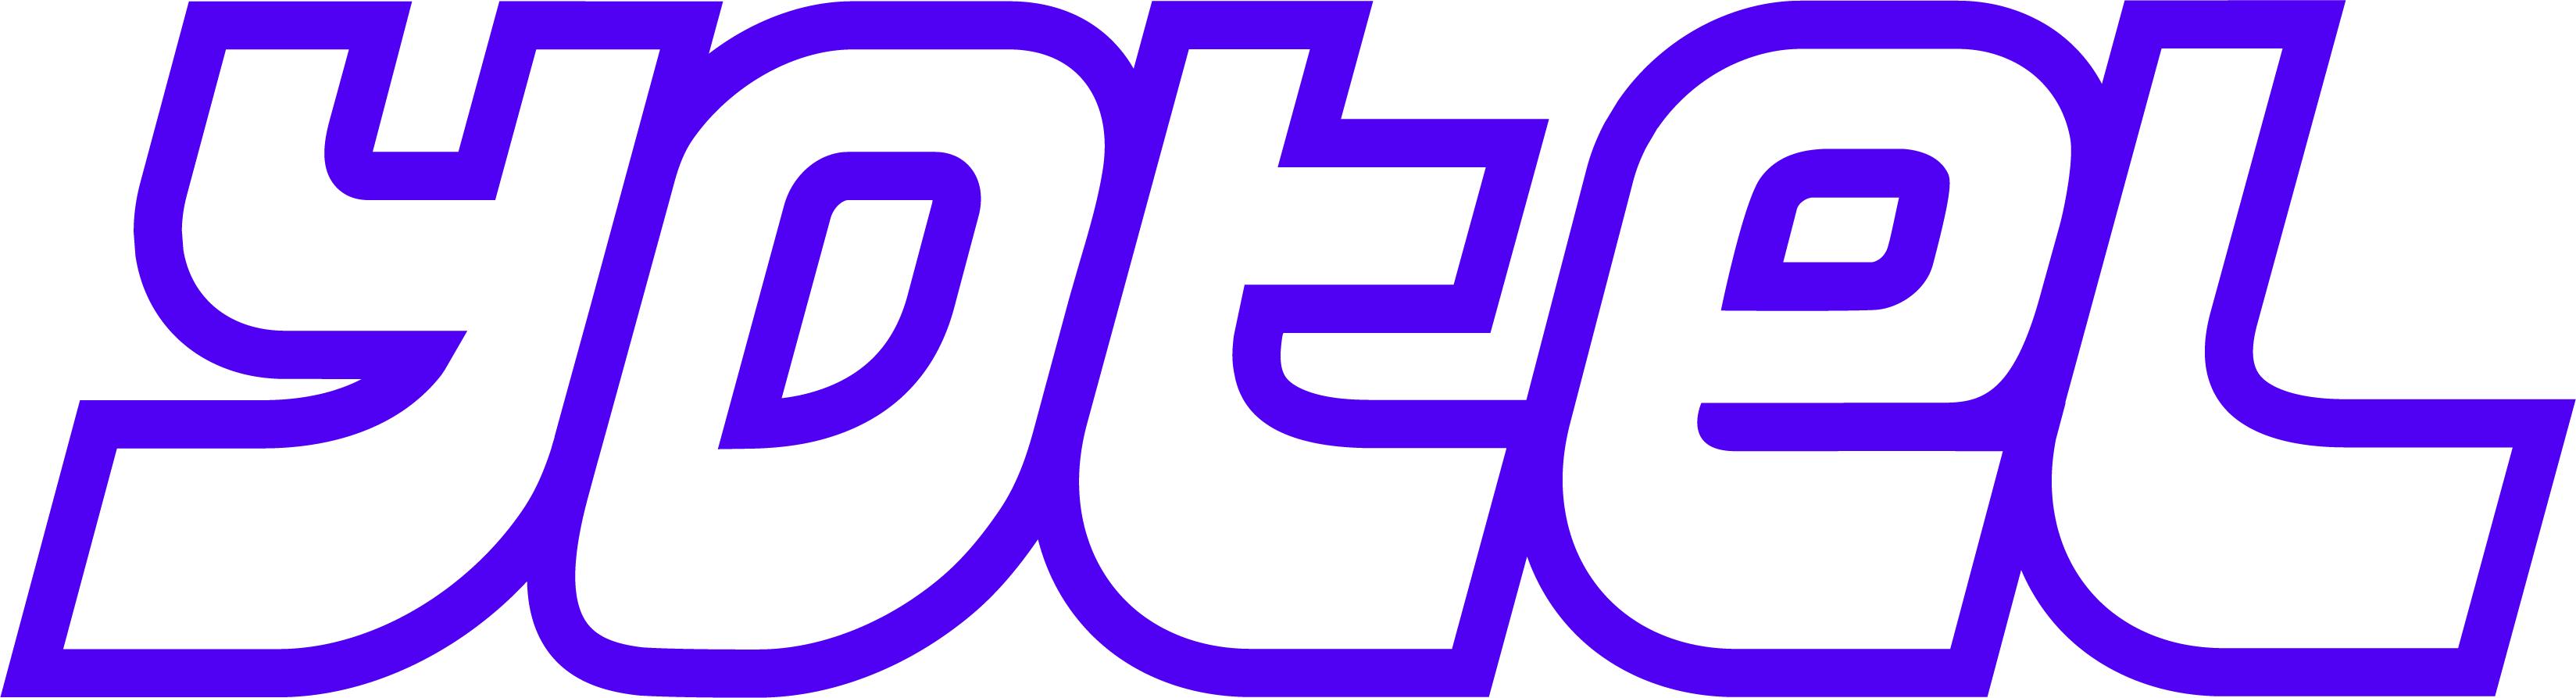 Logo Yotel France